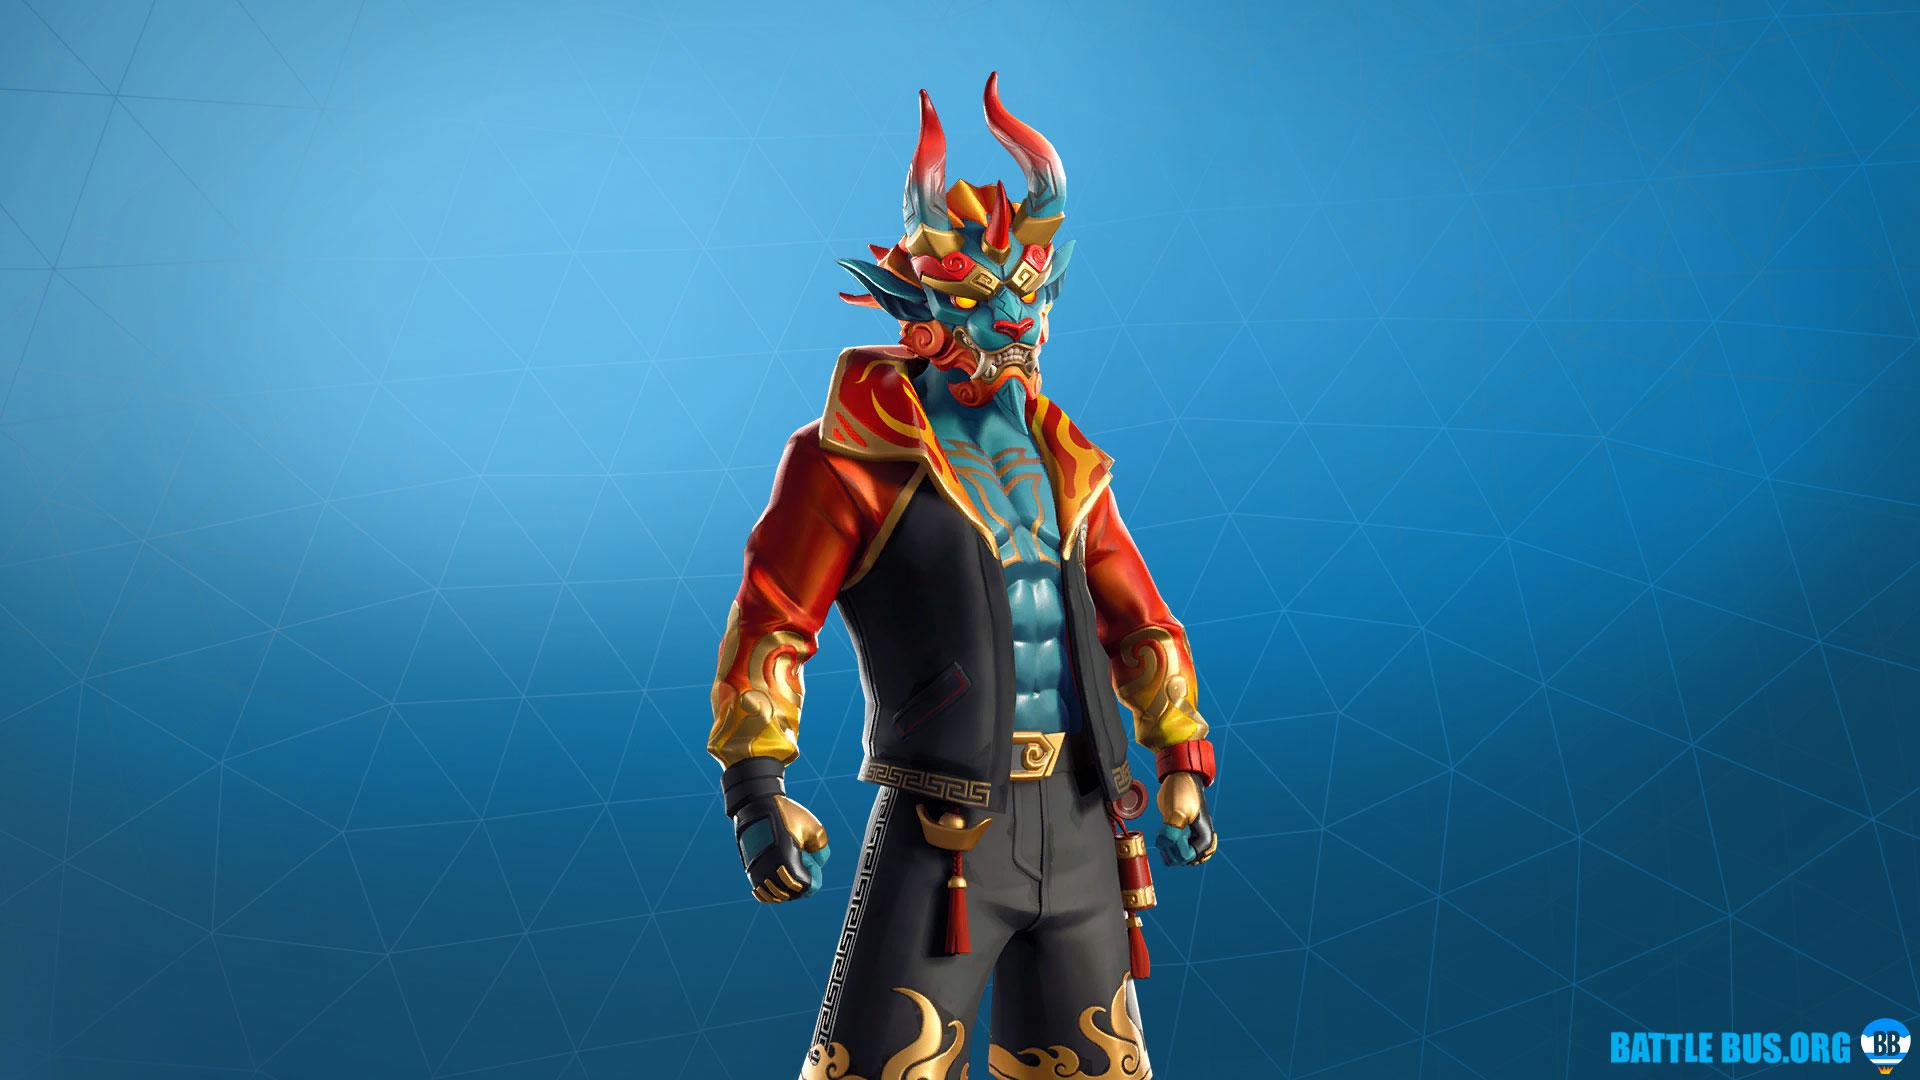 Fortnite Wallpaper Firewalker Outfit